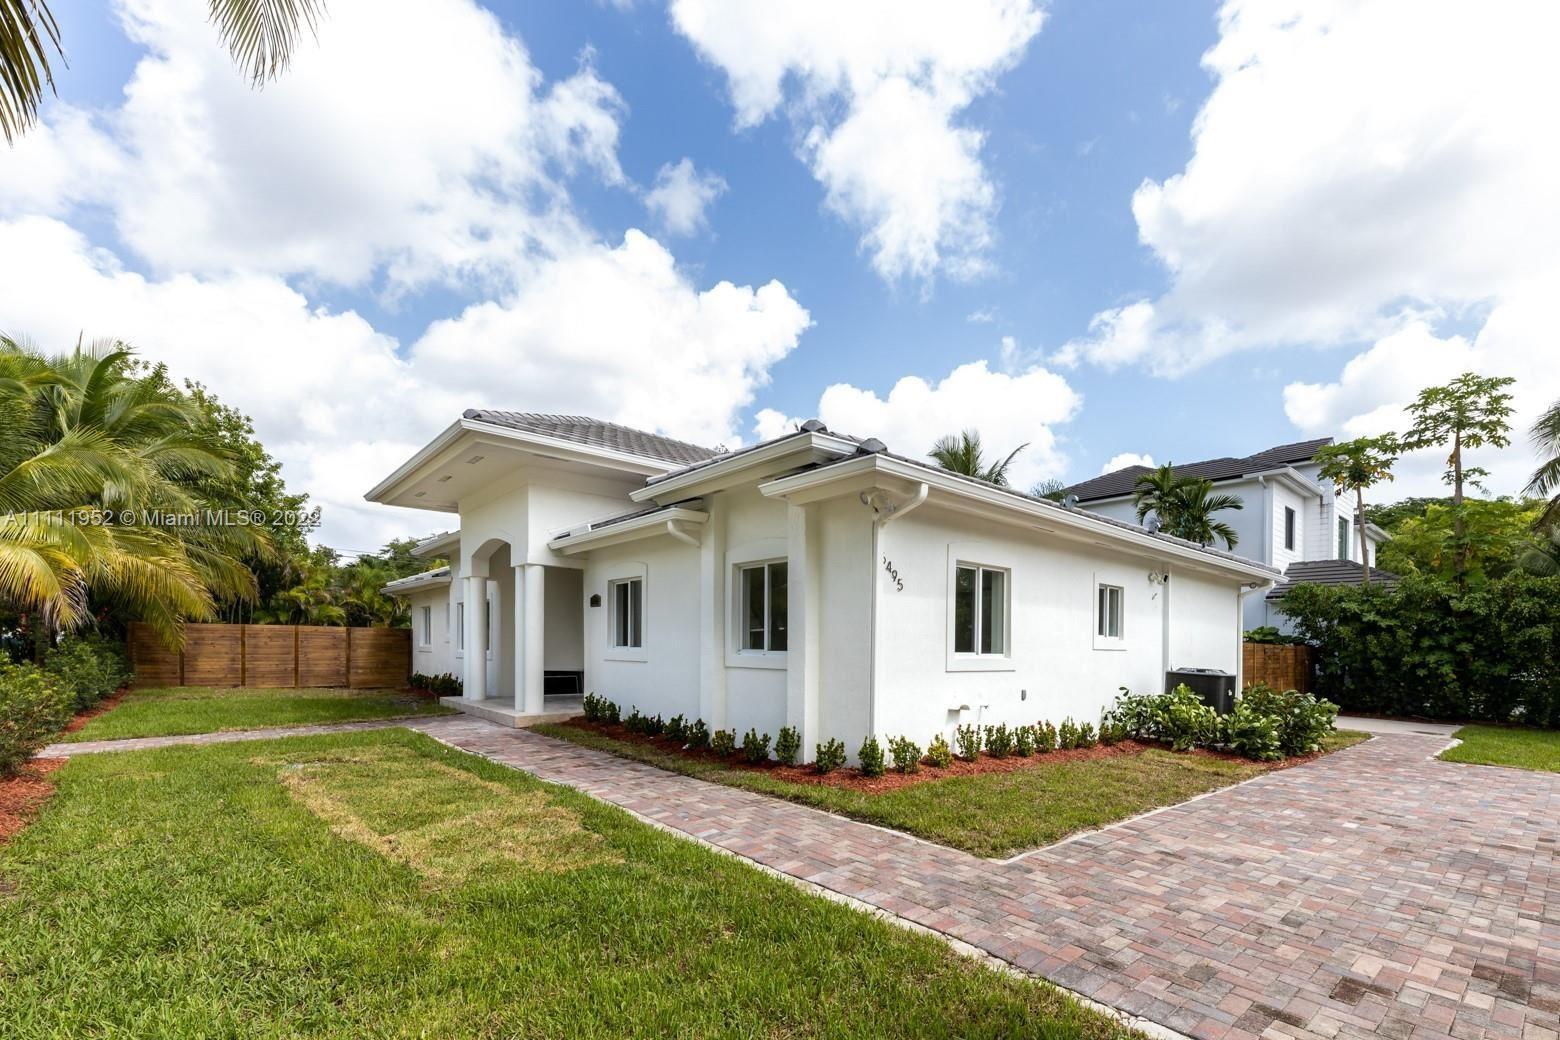 6495 SW 83rd St, Miami, FL 33143 - #: A11111952